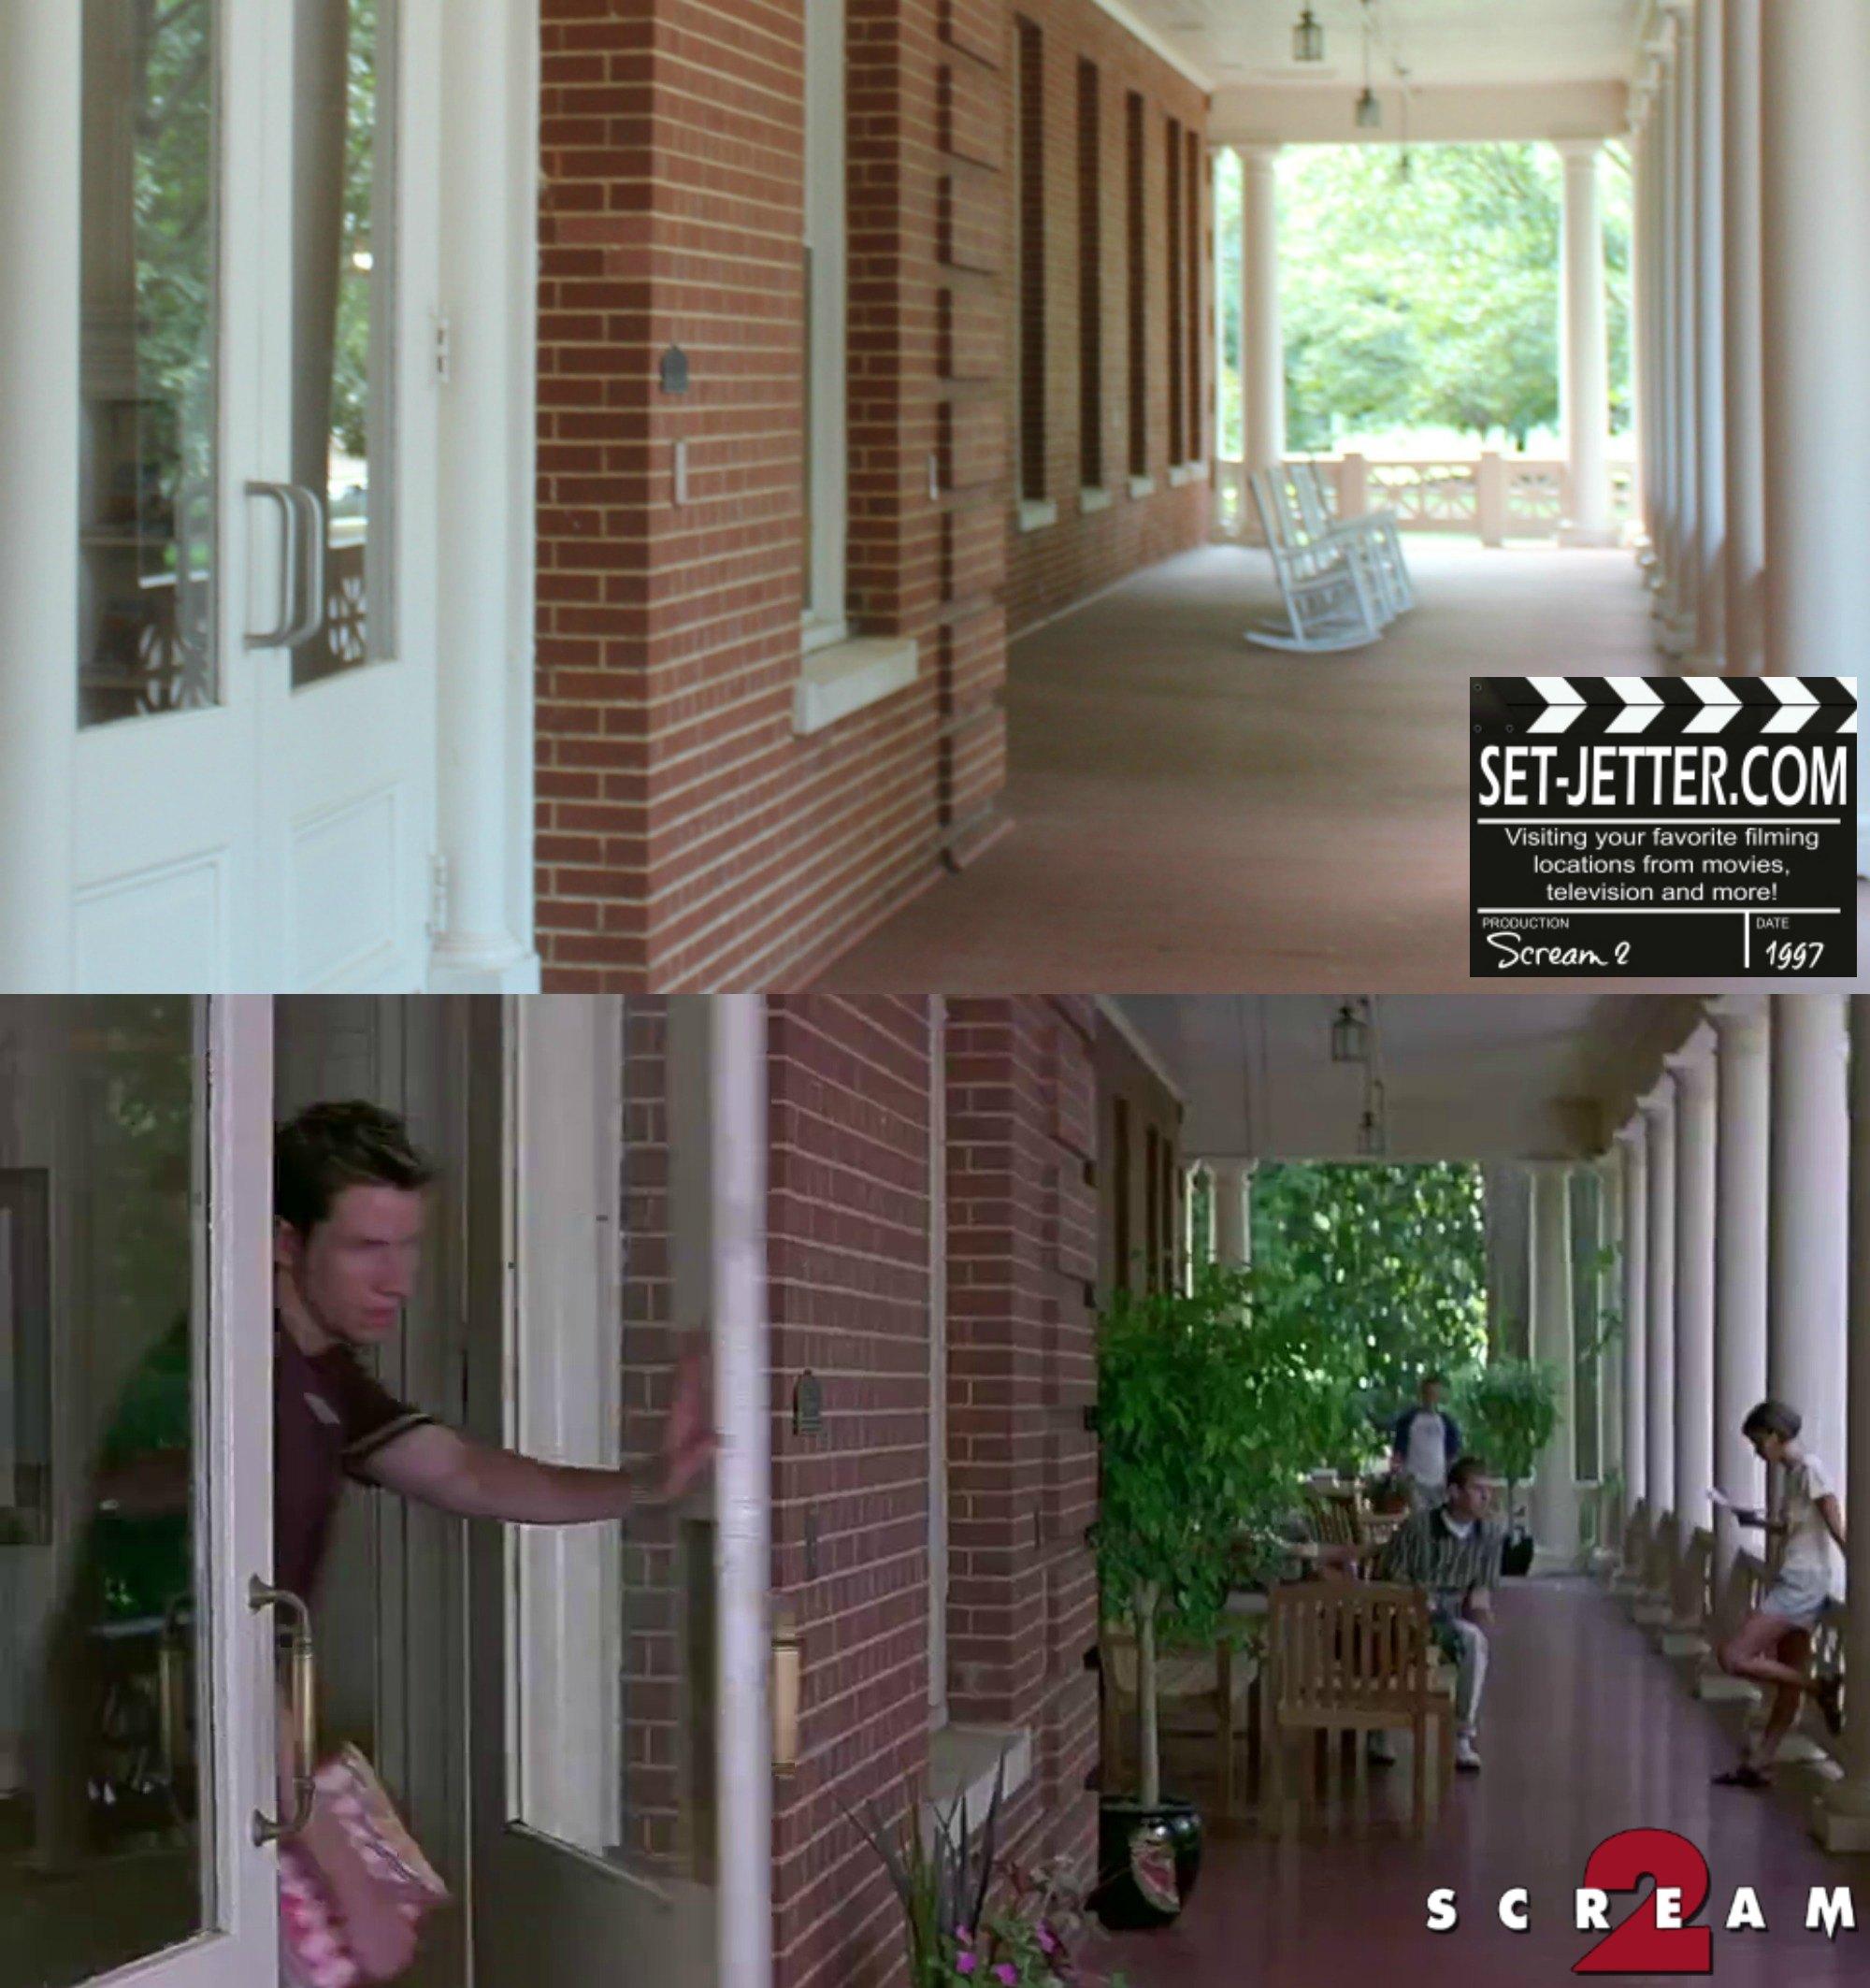 Scream 2 comparison 30.jpg